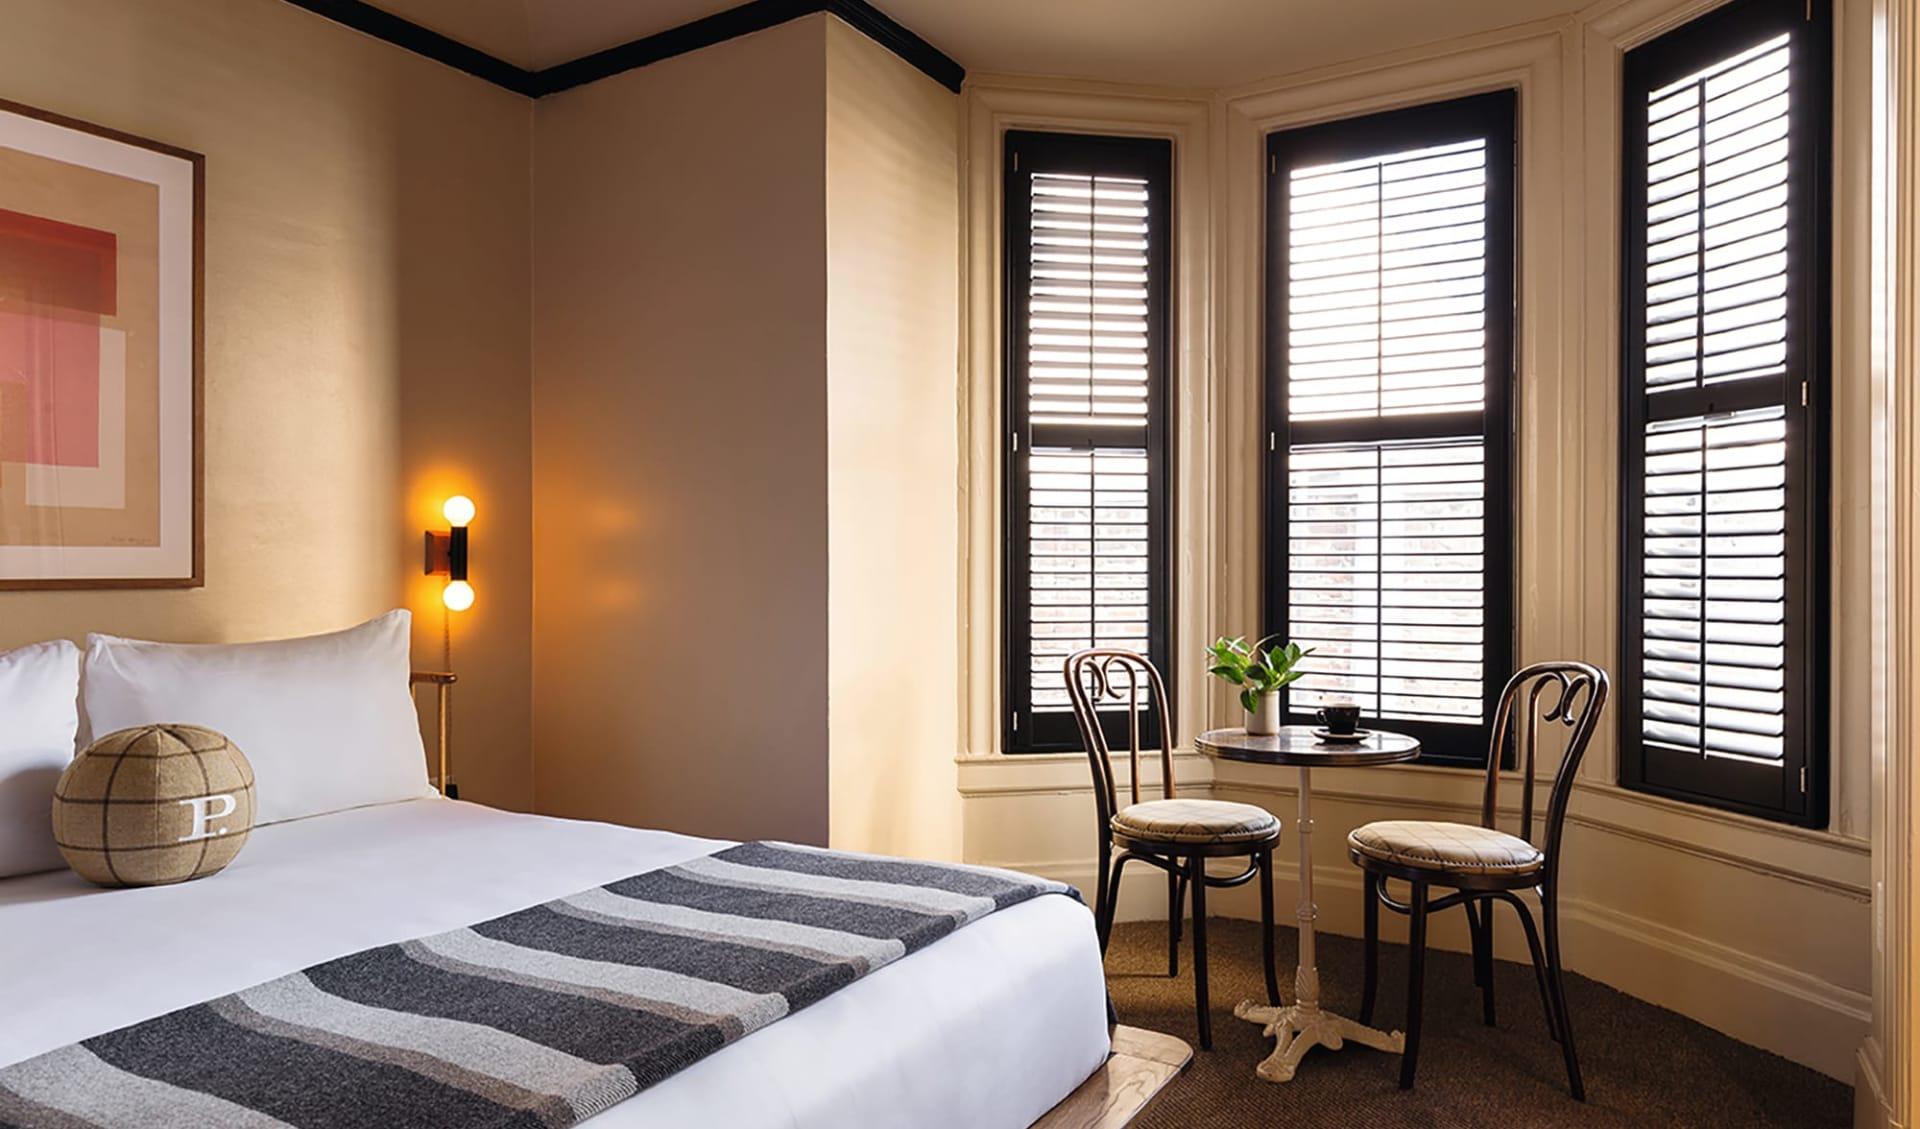 Palihotel (ehemals Mystic Hotel by Charlie Palmer) in San Francisco: Room_Palihotel_SFO_Palihotel-web!